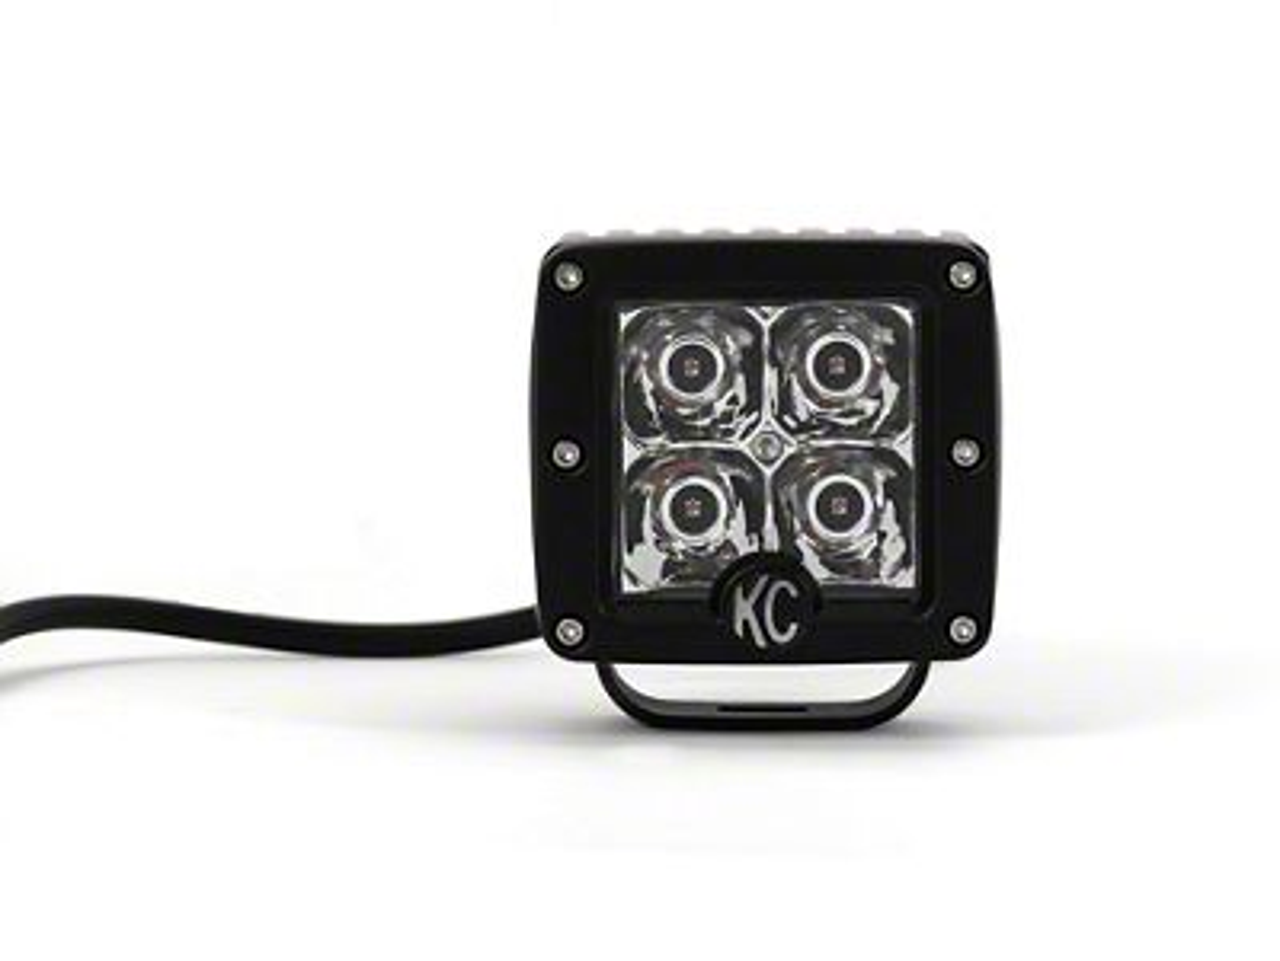 KC HiLiTES 3 in. C-Series C3 Amber LED Cube Light - Spot Beam